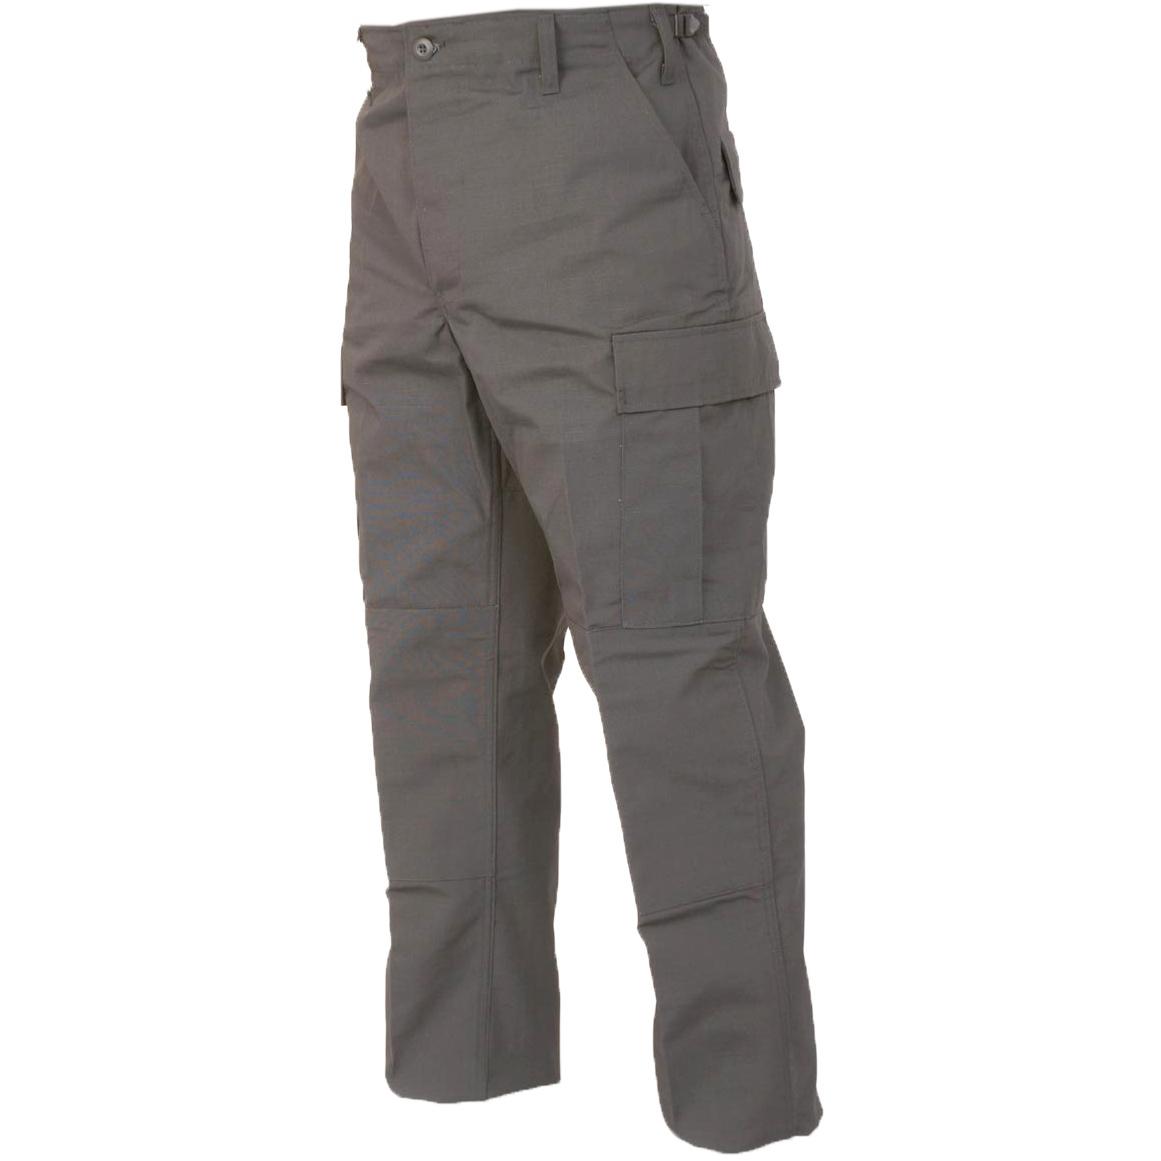 Tru-Spec Mens Tactical Response Uniform Pants Pantalon d/écontract/é 31-35 Homme Bleu Marine